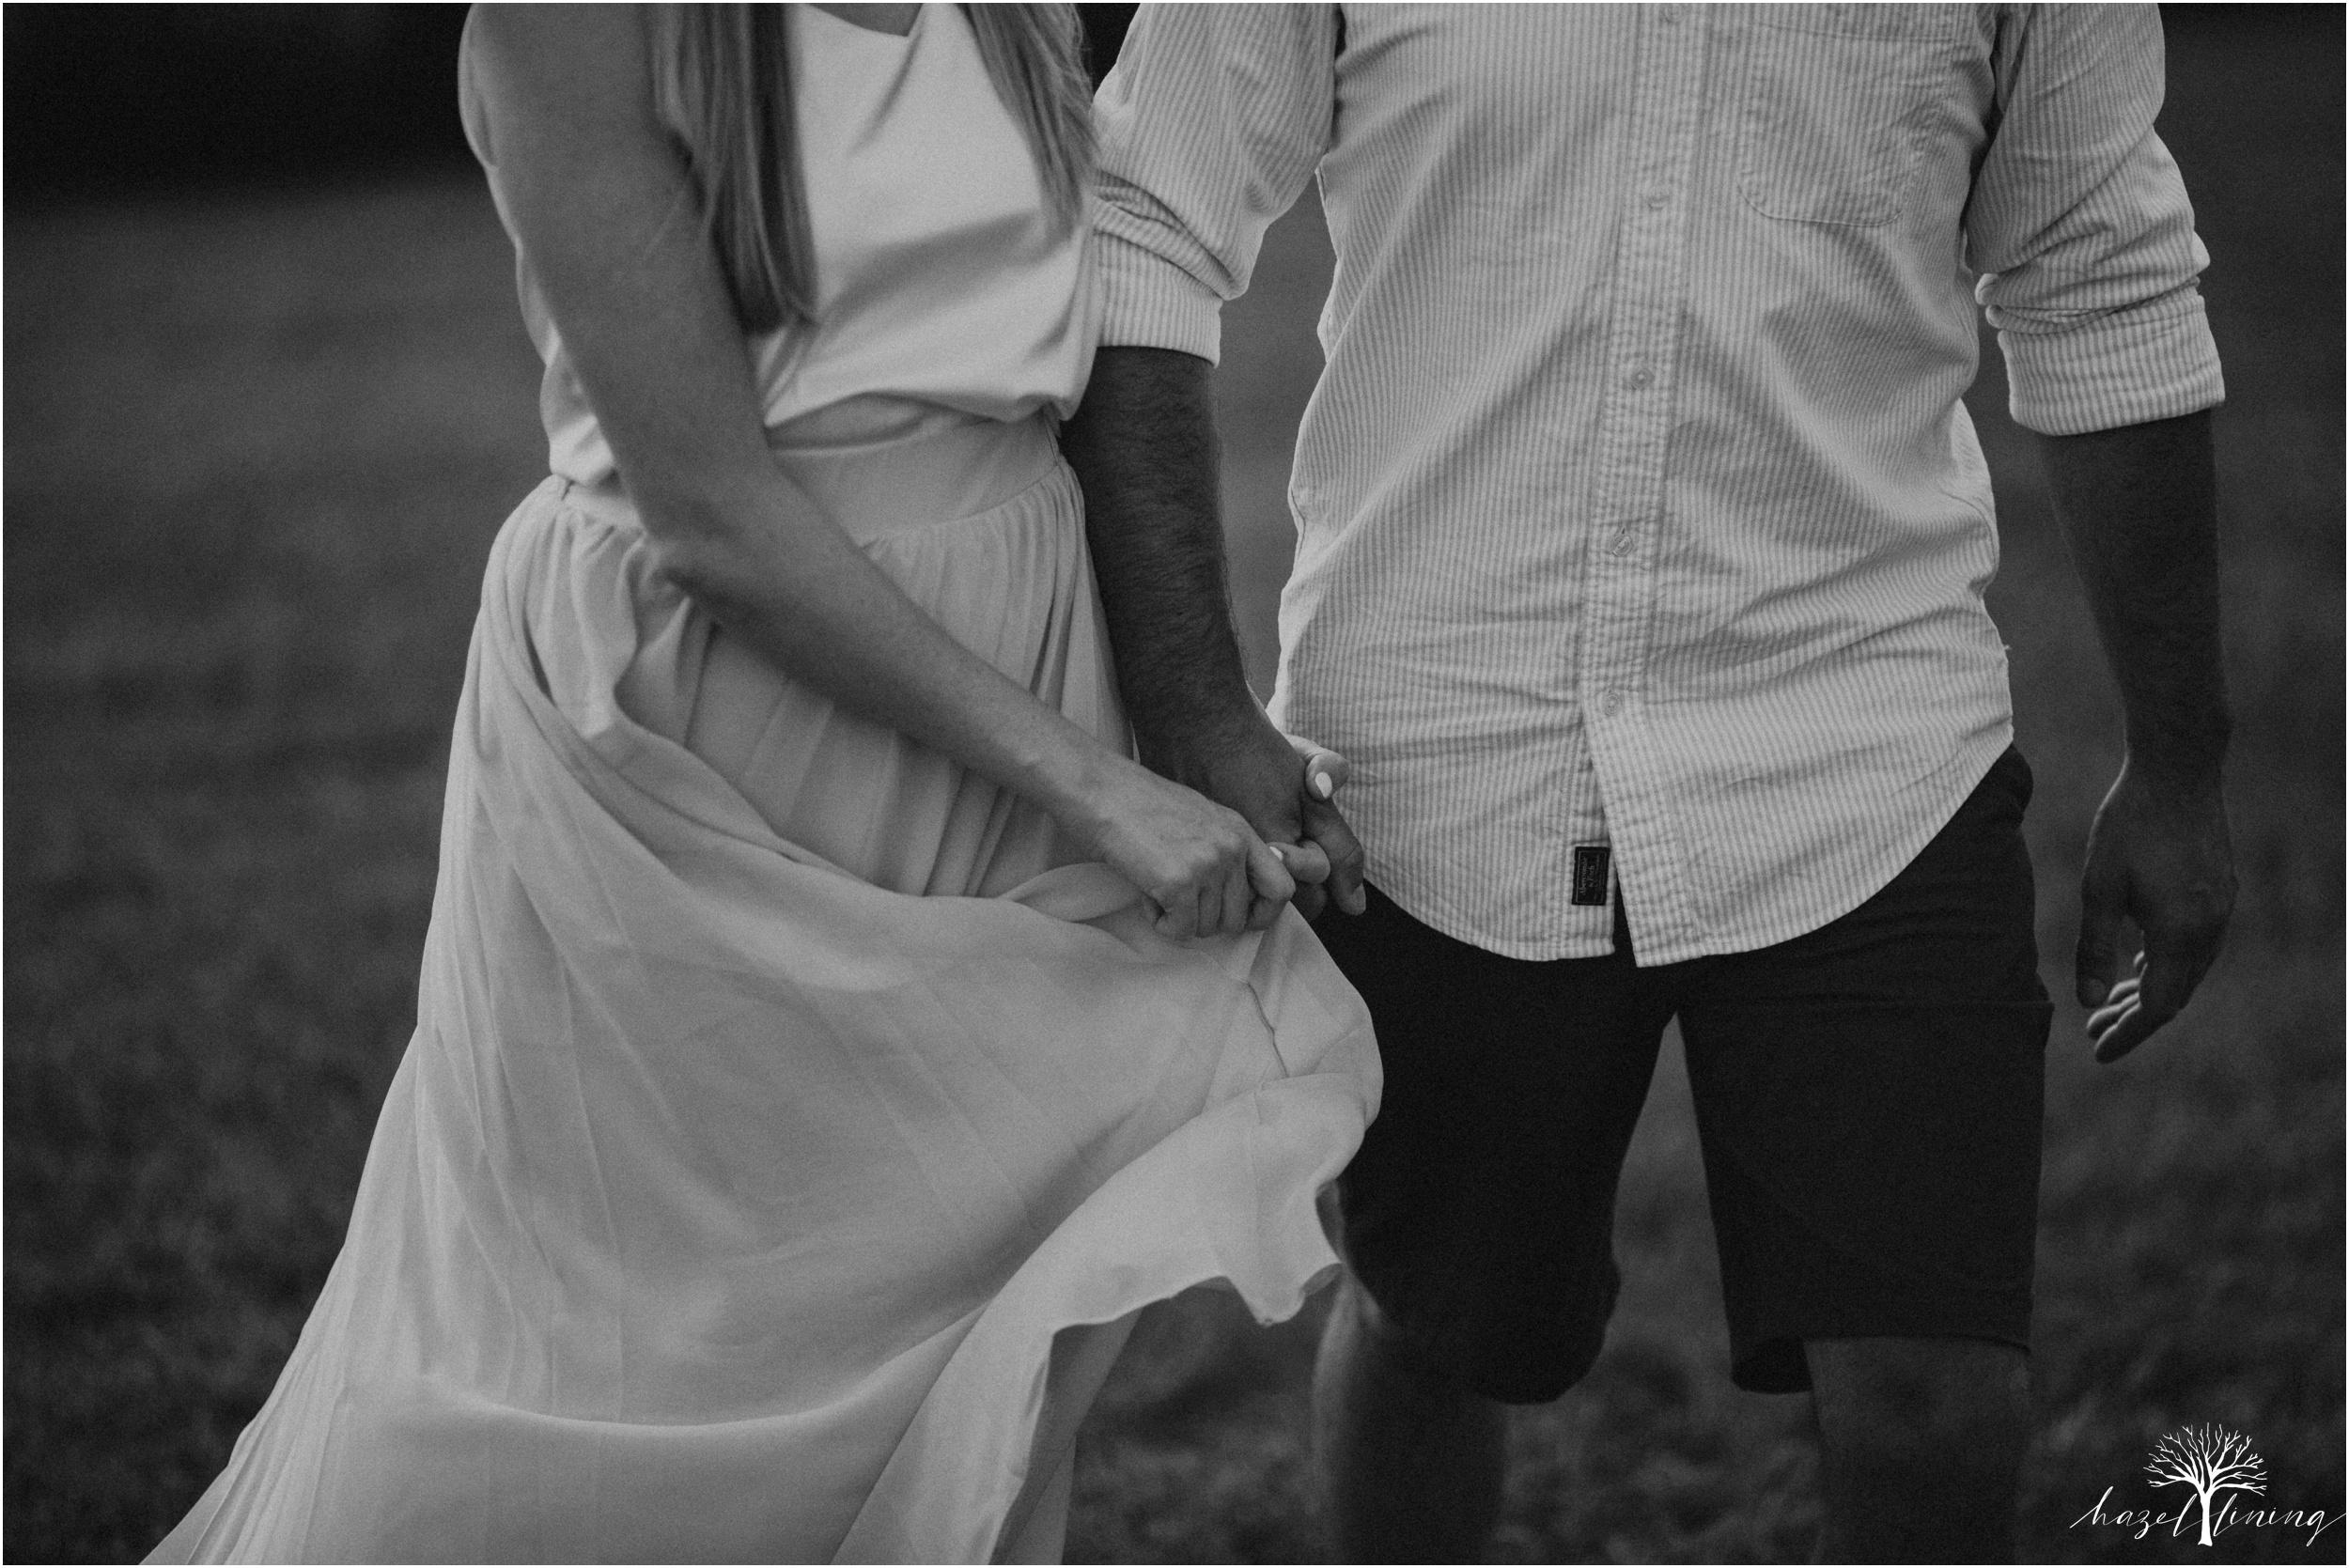 ashley-fillmore-steve-reimer-trexler-nature-preserve-summer-engagement-session-schnecksville-pennsylvania-hazel-lining-photography-destination-elopement-wedding-engagement-photography_0060.jpg